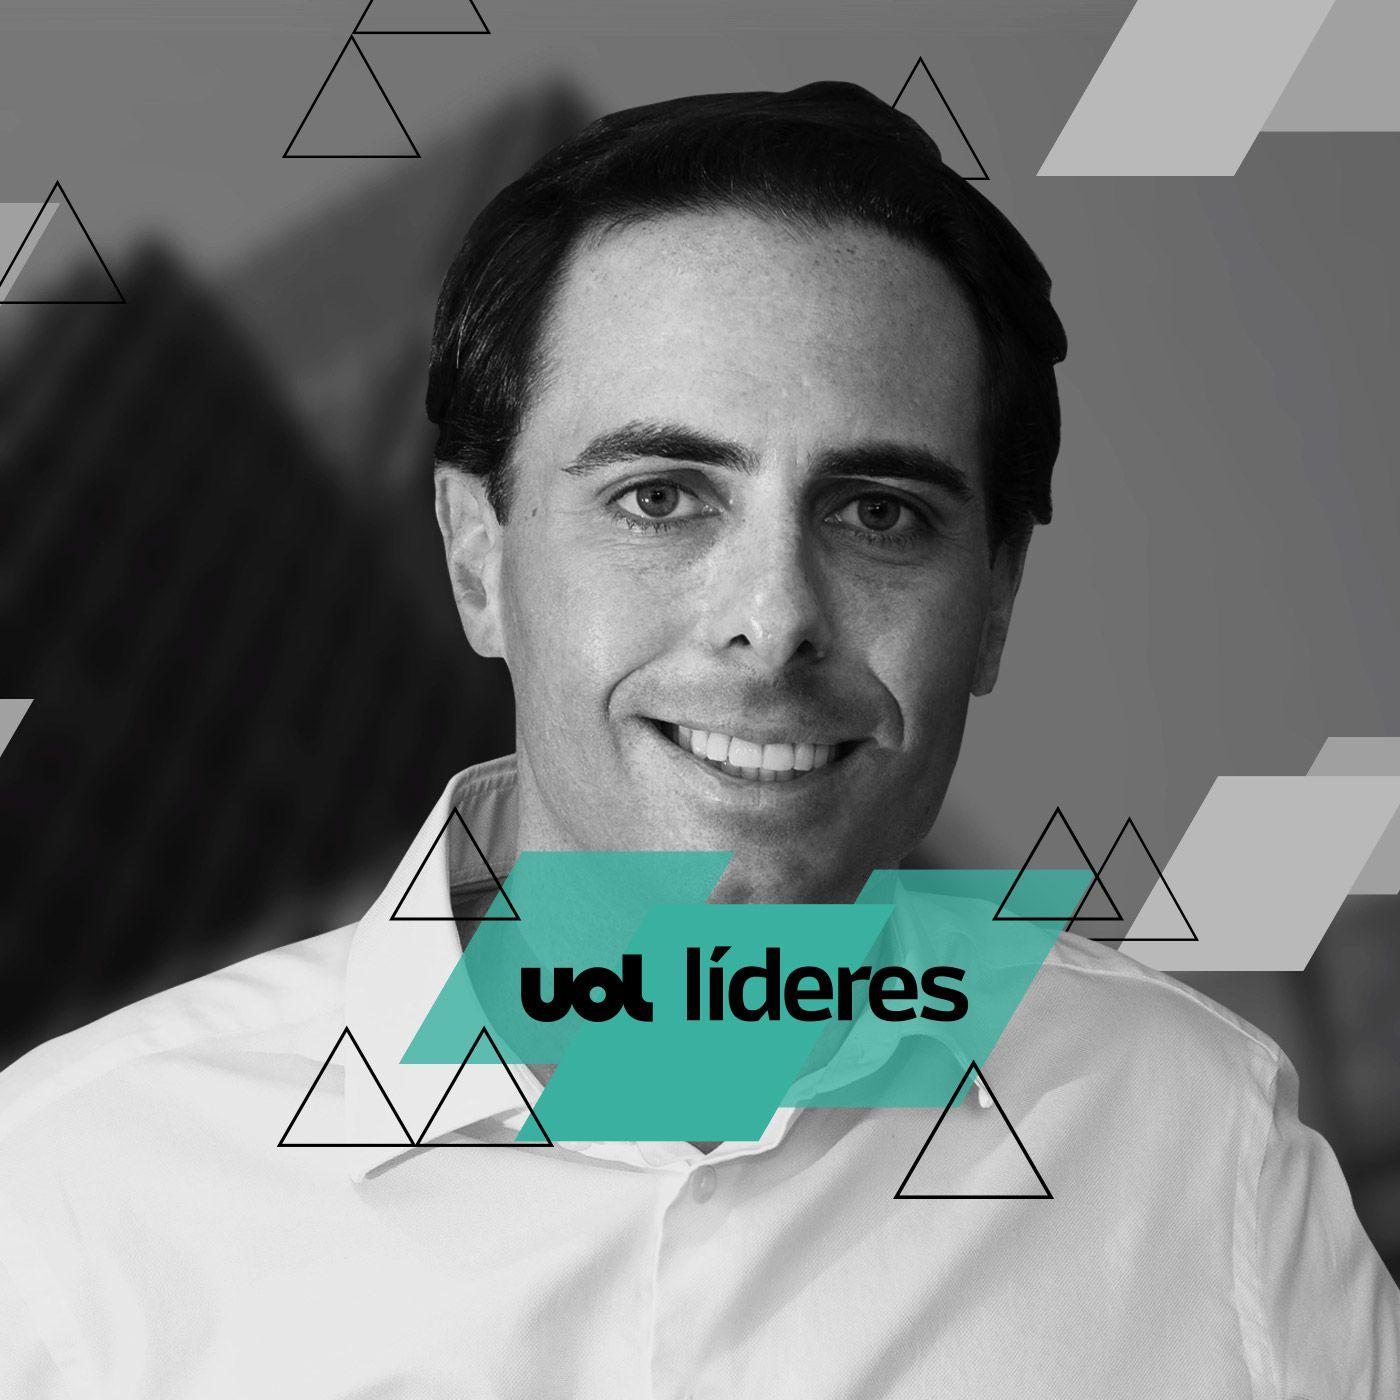 Diego Villar (Moura Dubeux): Imóvel de lazer no Nordeste vira refúgio na pandemia